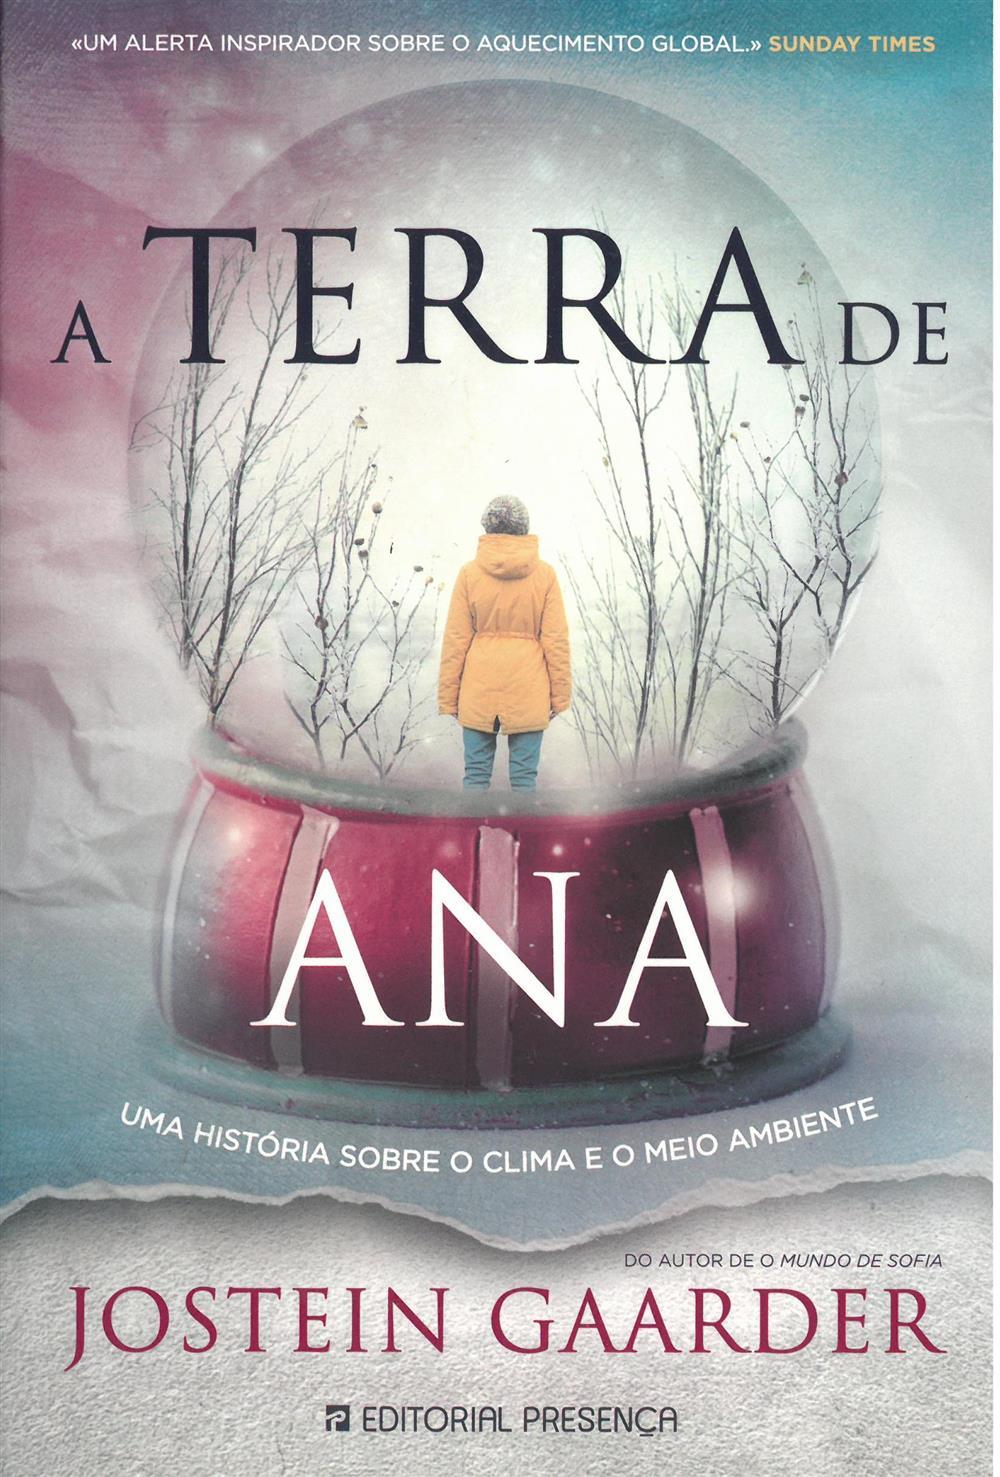 A terra de Ana.jpg